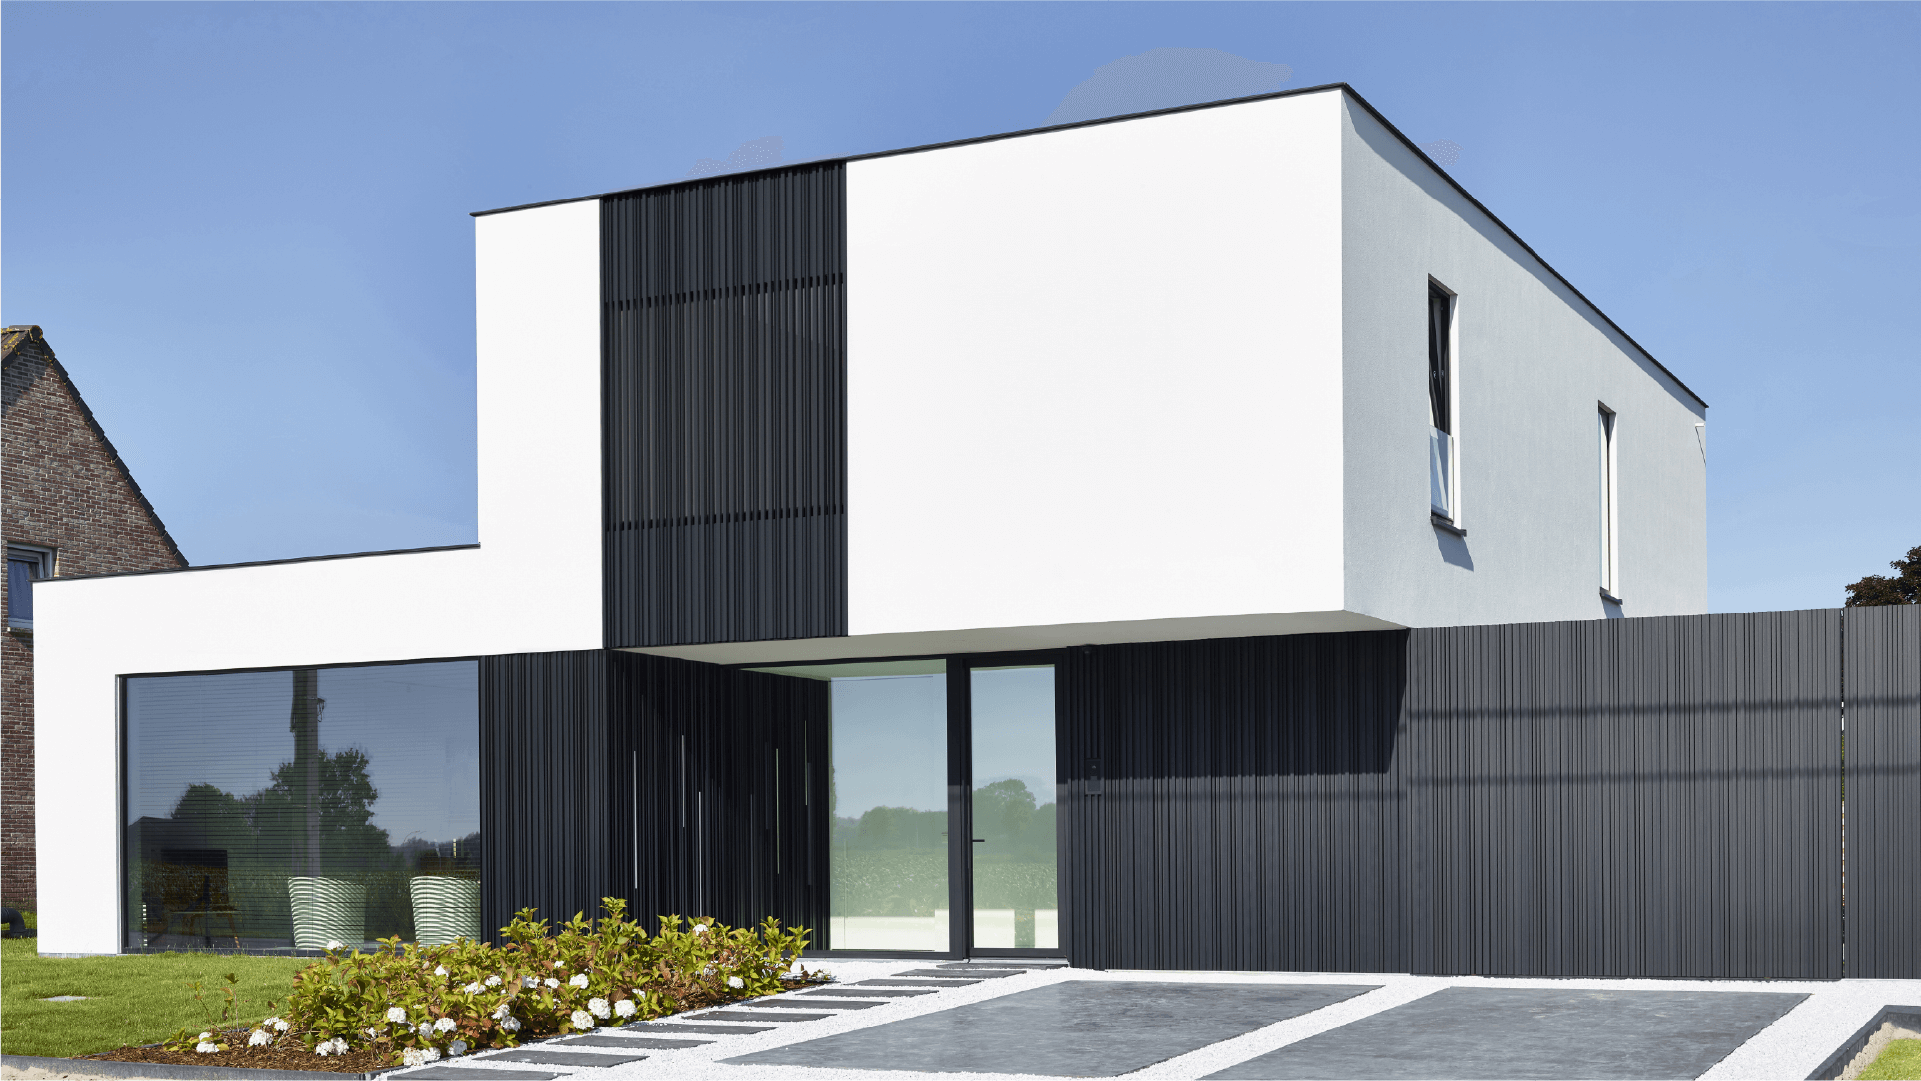 Alu-Wall Linarte aluminium profielen gevelbekleding